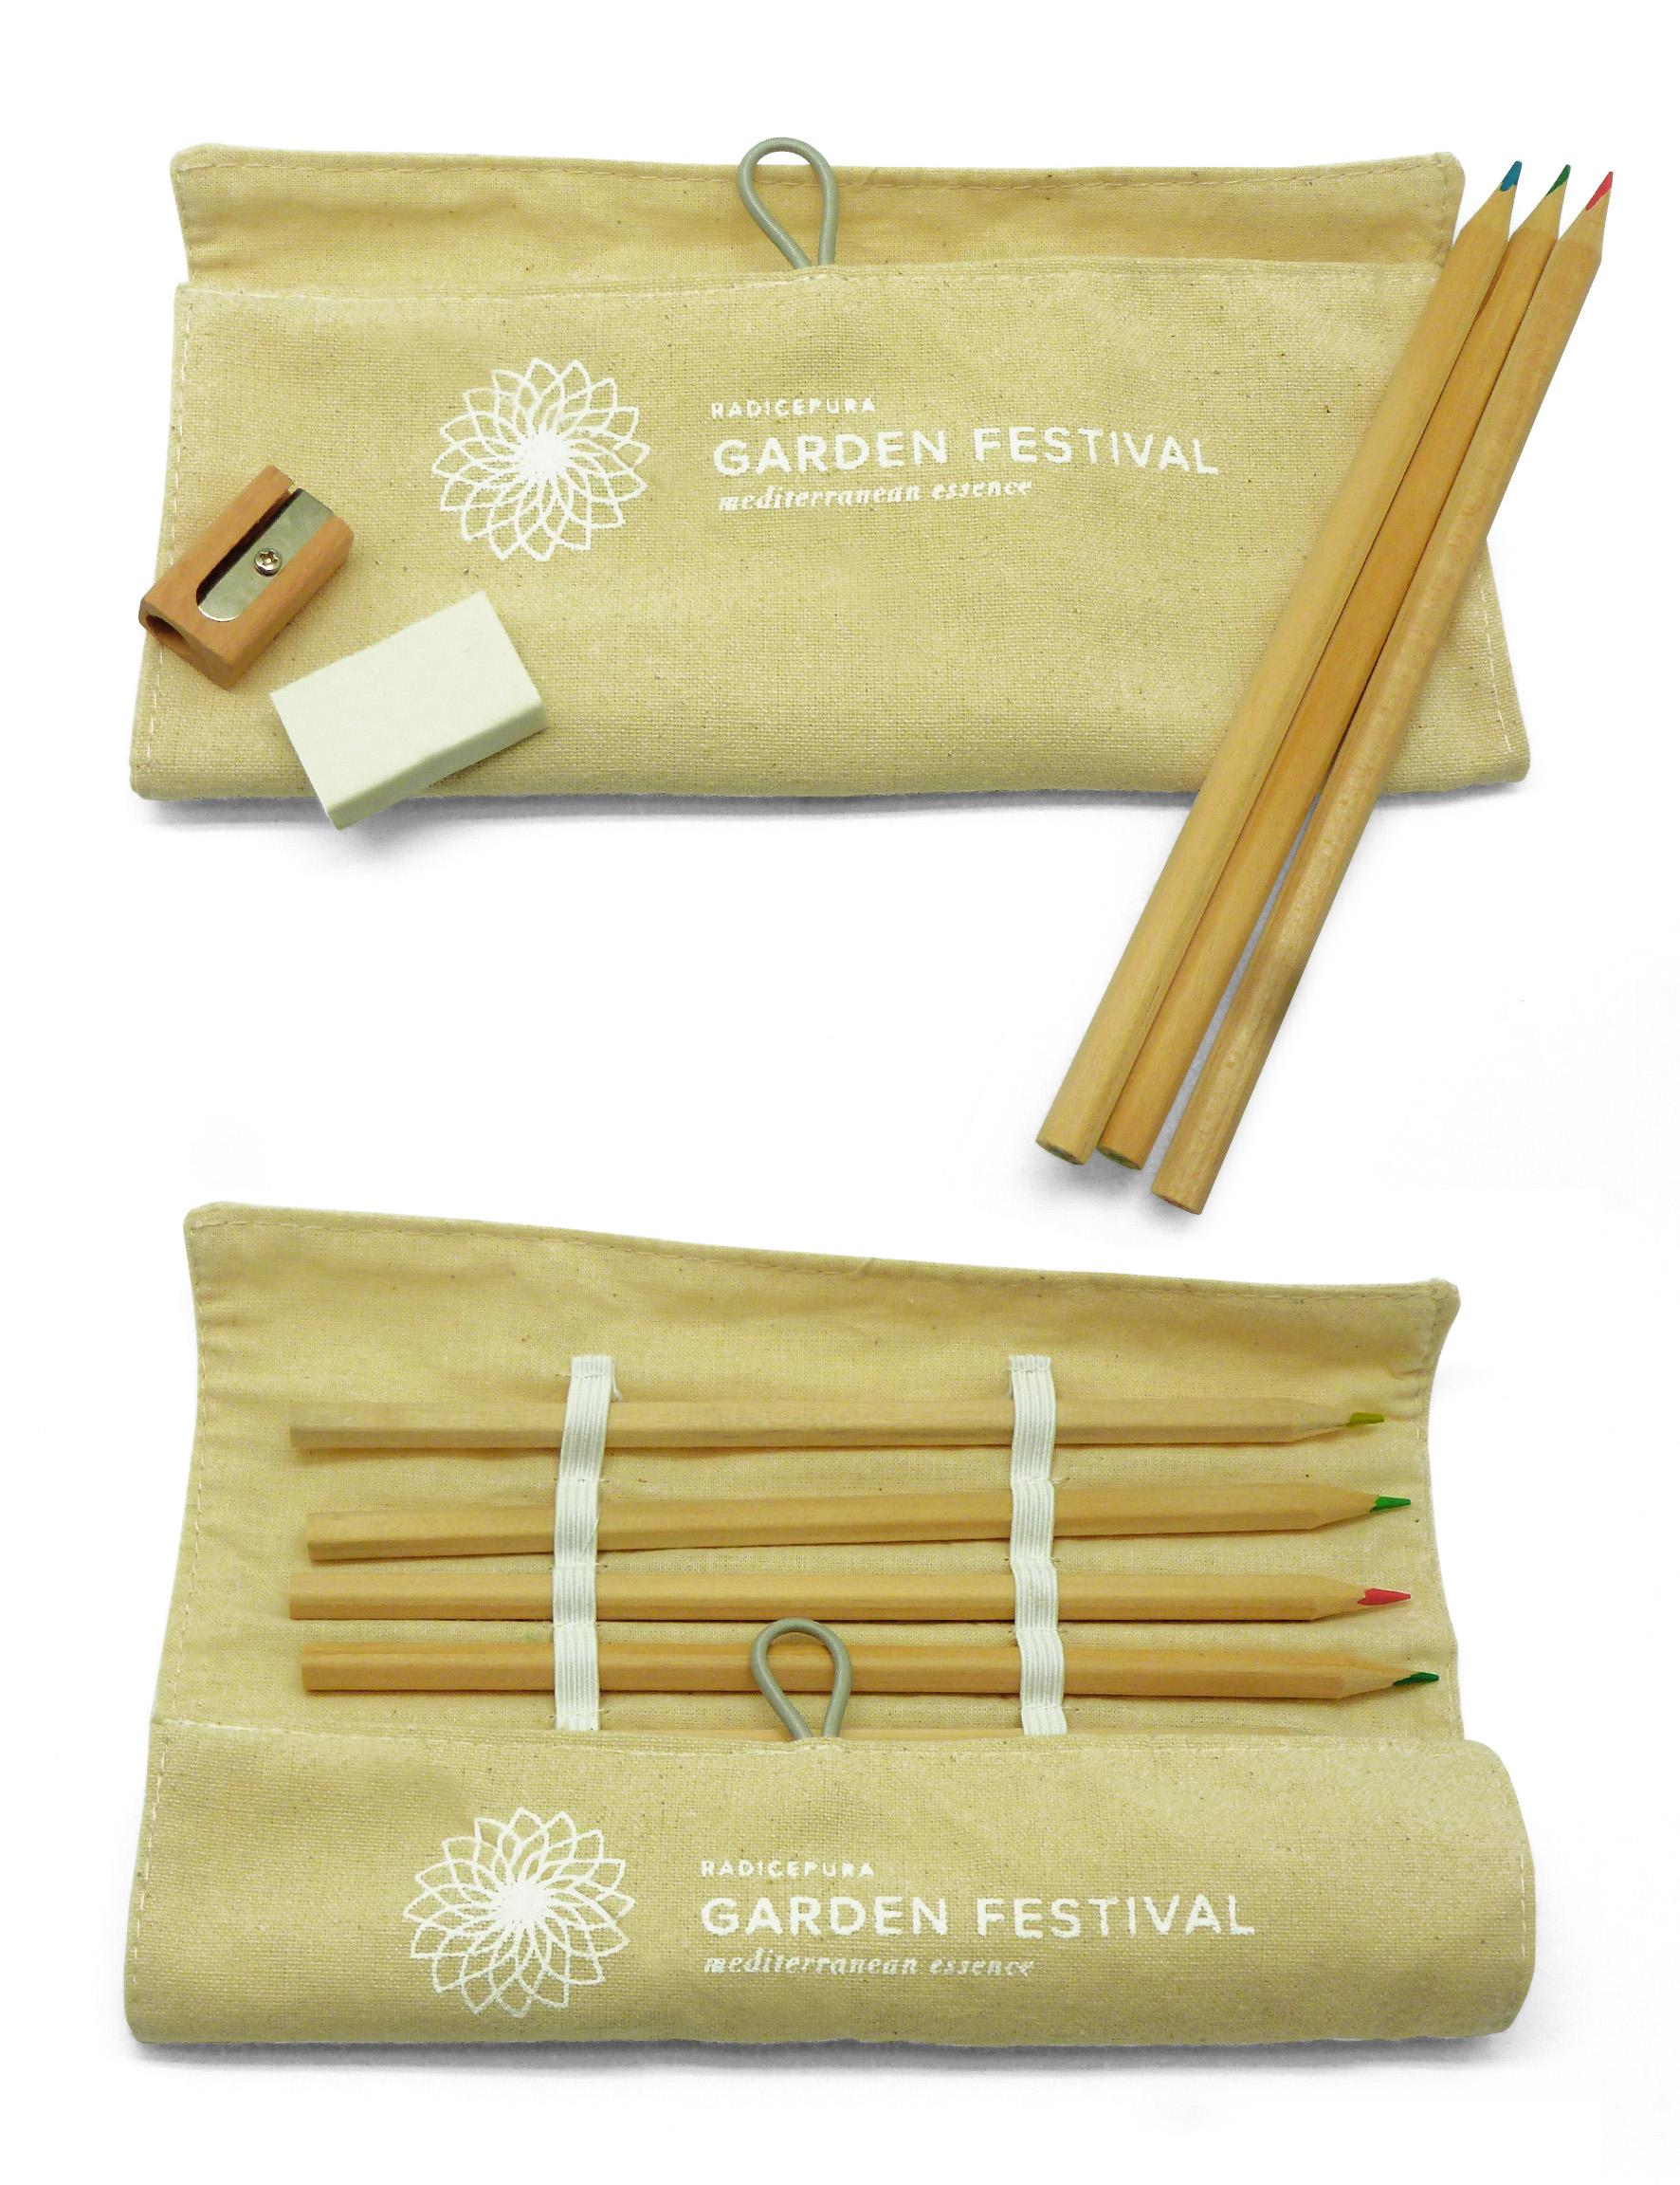 Set ecologico pastelli ed astuccio ecofriendly per RadicePura Garden festival